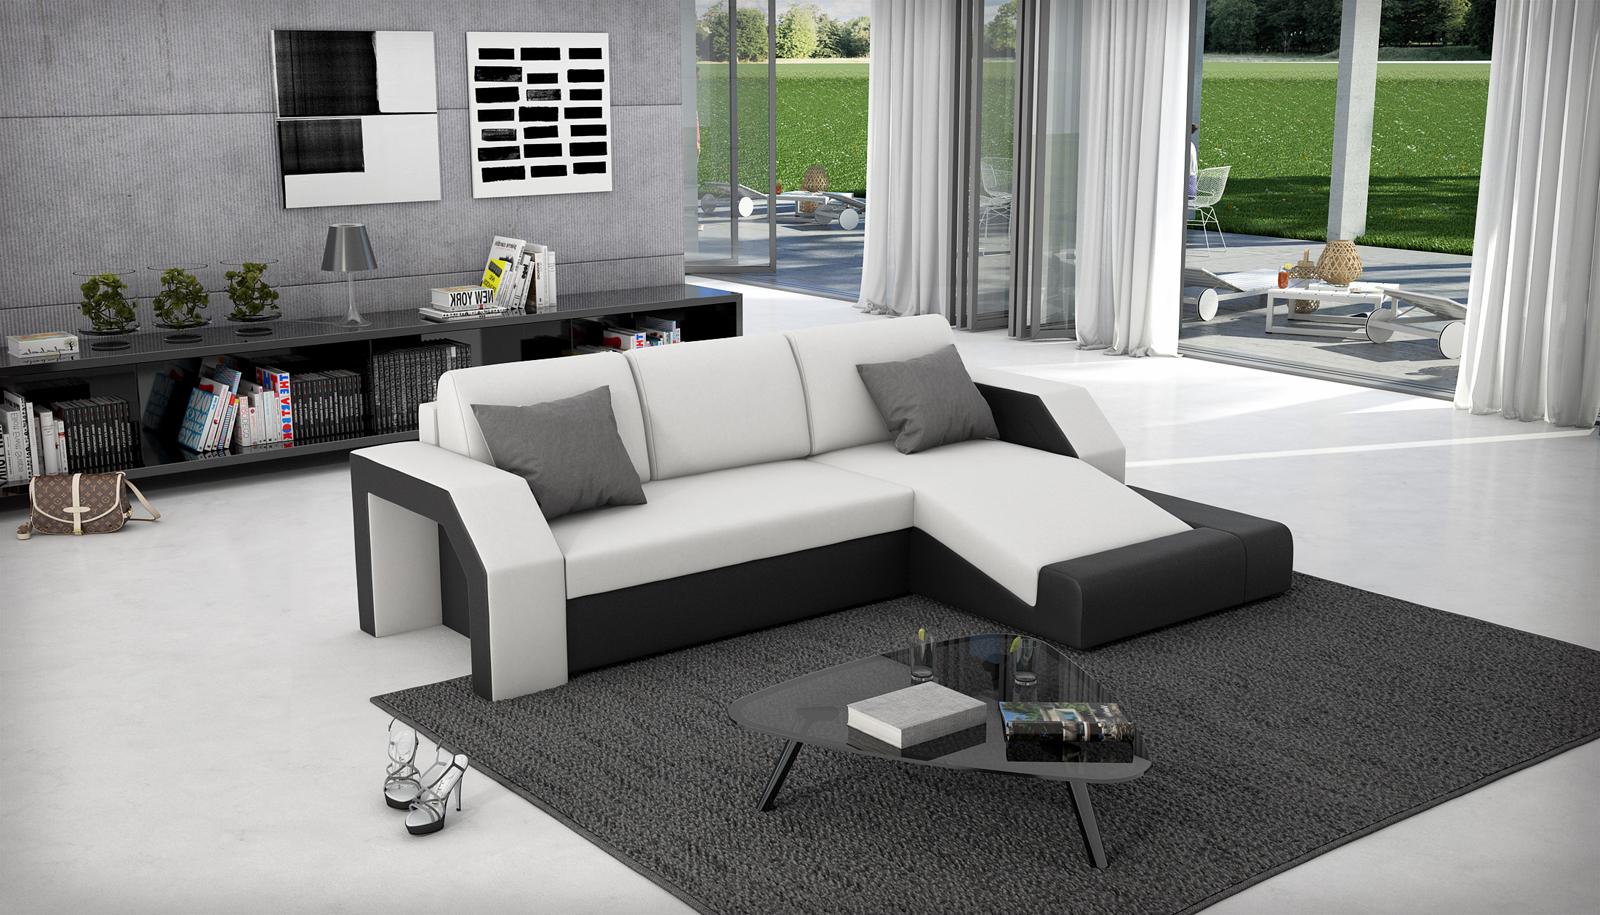 sam schlafsofa wei schwarz ecksofa milagro 281 x 145 cm. Black Bedroom Furniture Sets. Home Design Ideas